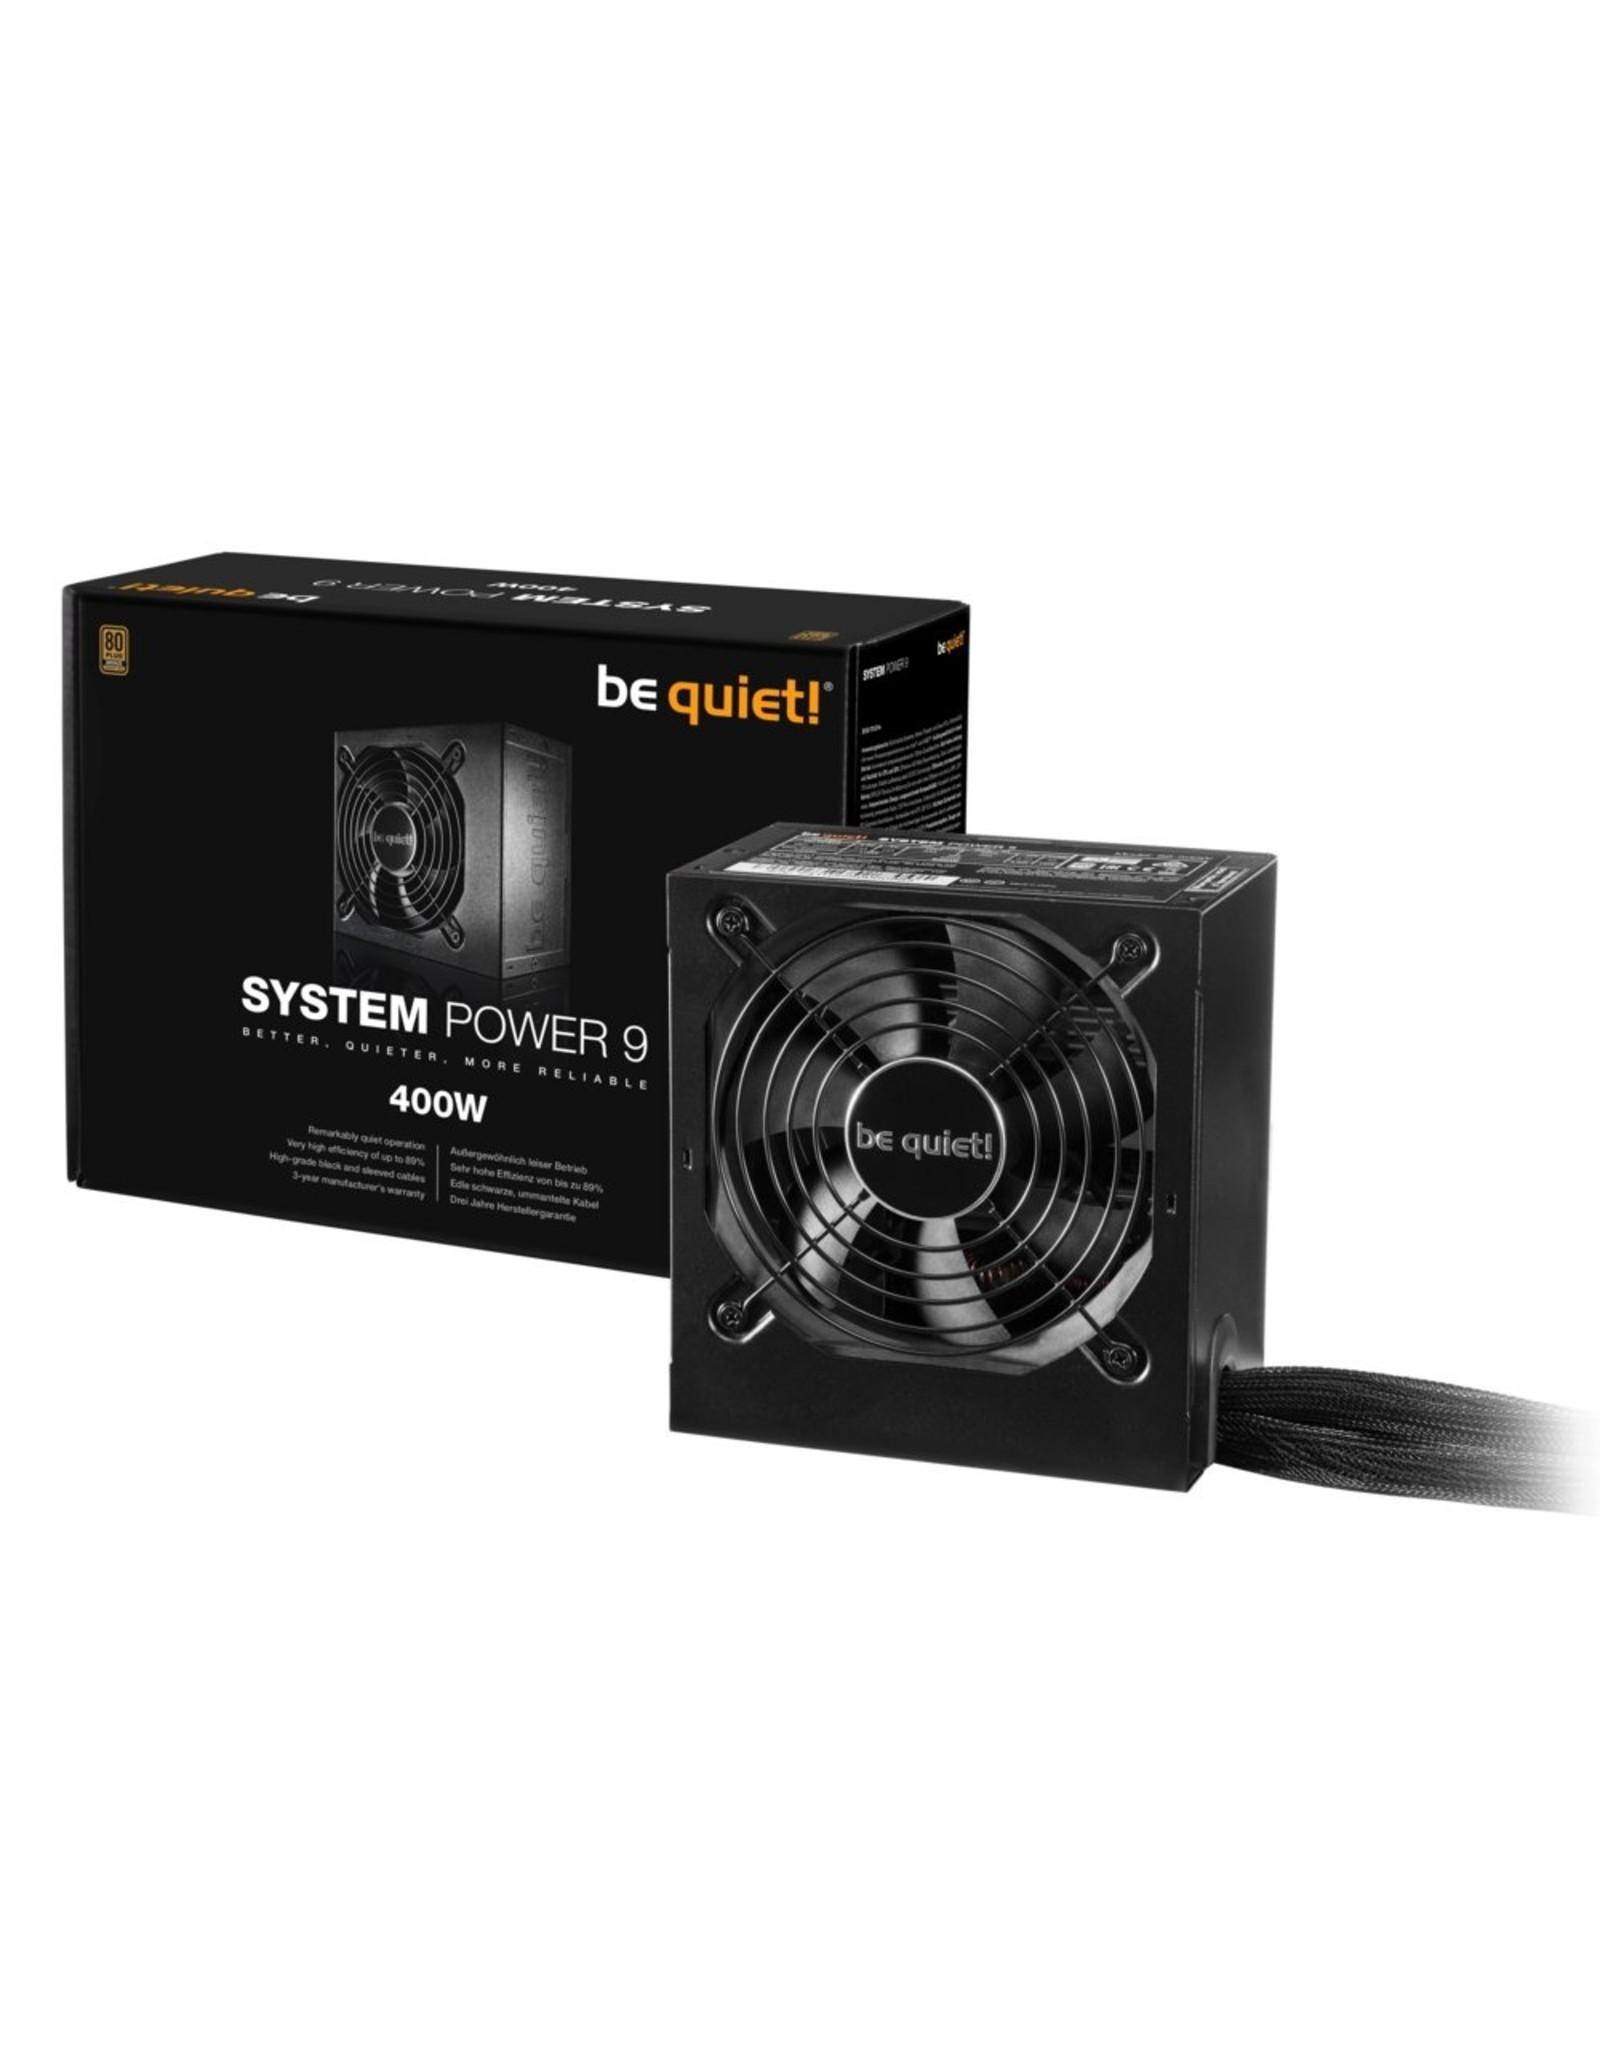 be quiet! PSU Be quiet! System Power 9 400W 20+4 pin ATX ATX Zwart